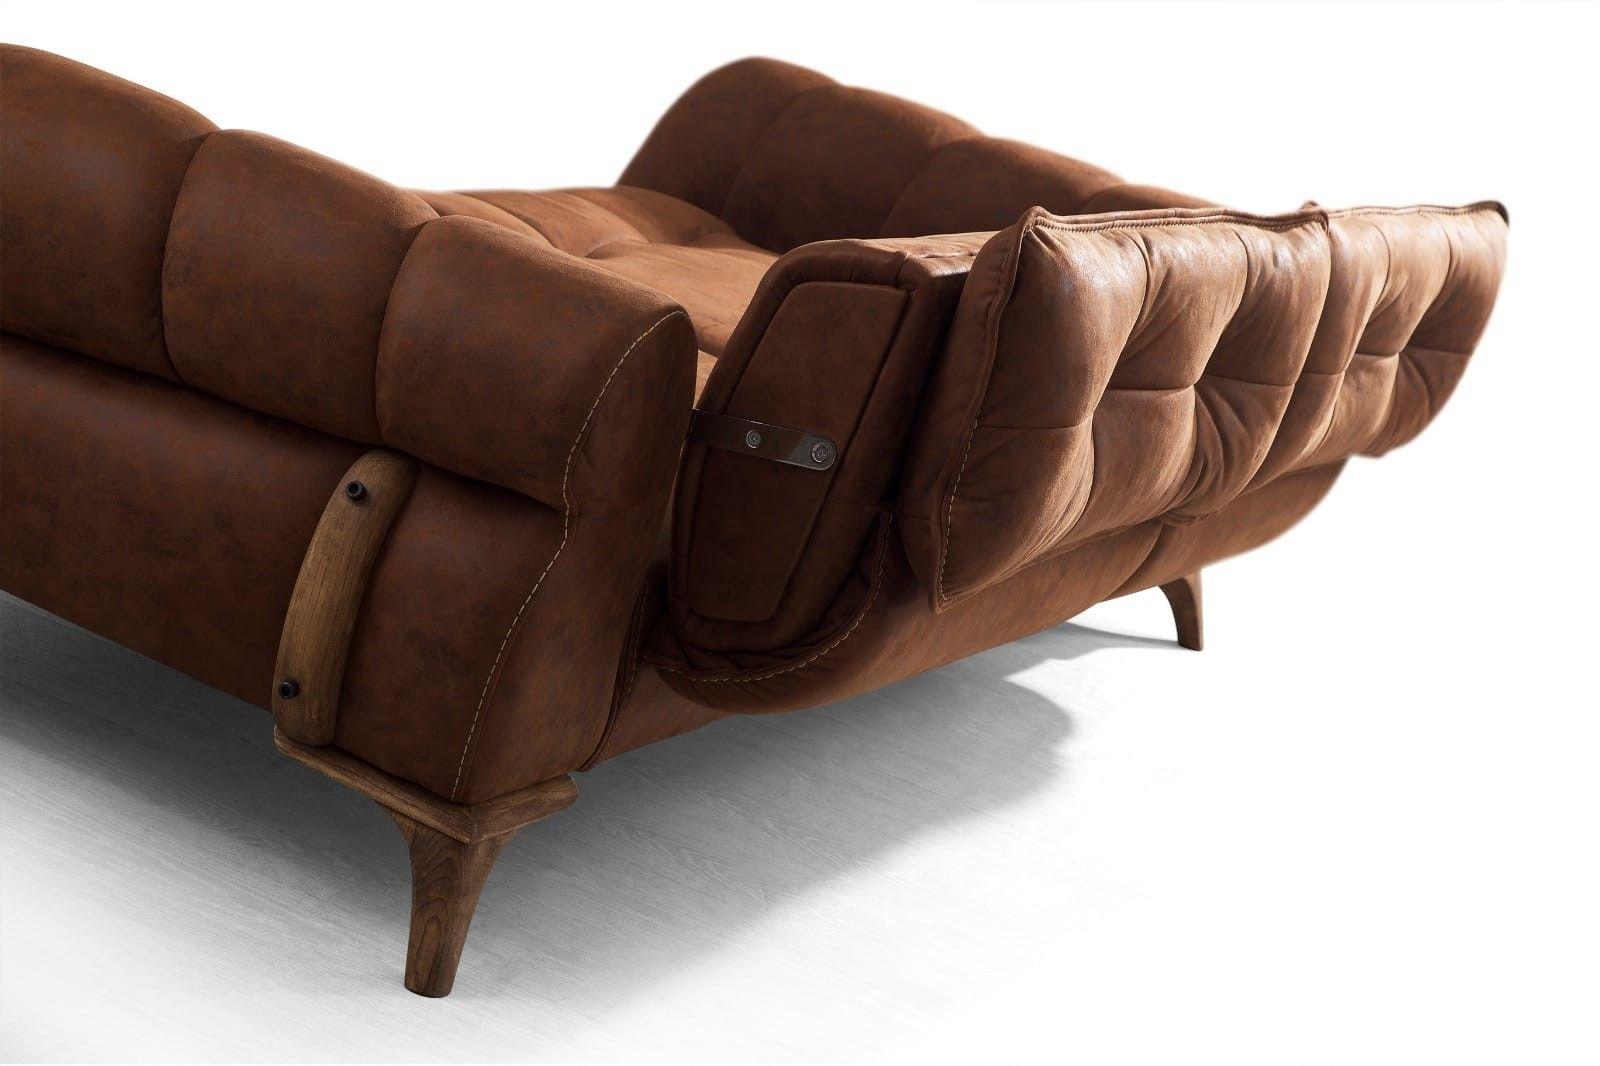 Beranikitchen Co Adli Kullanicinin Sofa Panosundaki Pin Armut Koltuk Mobilya Koltuklar